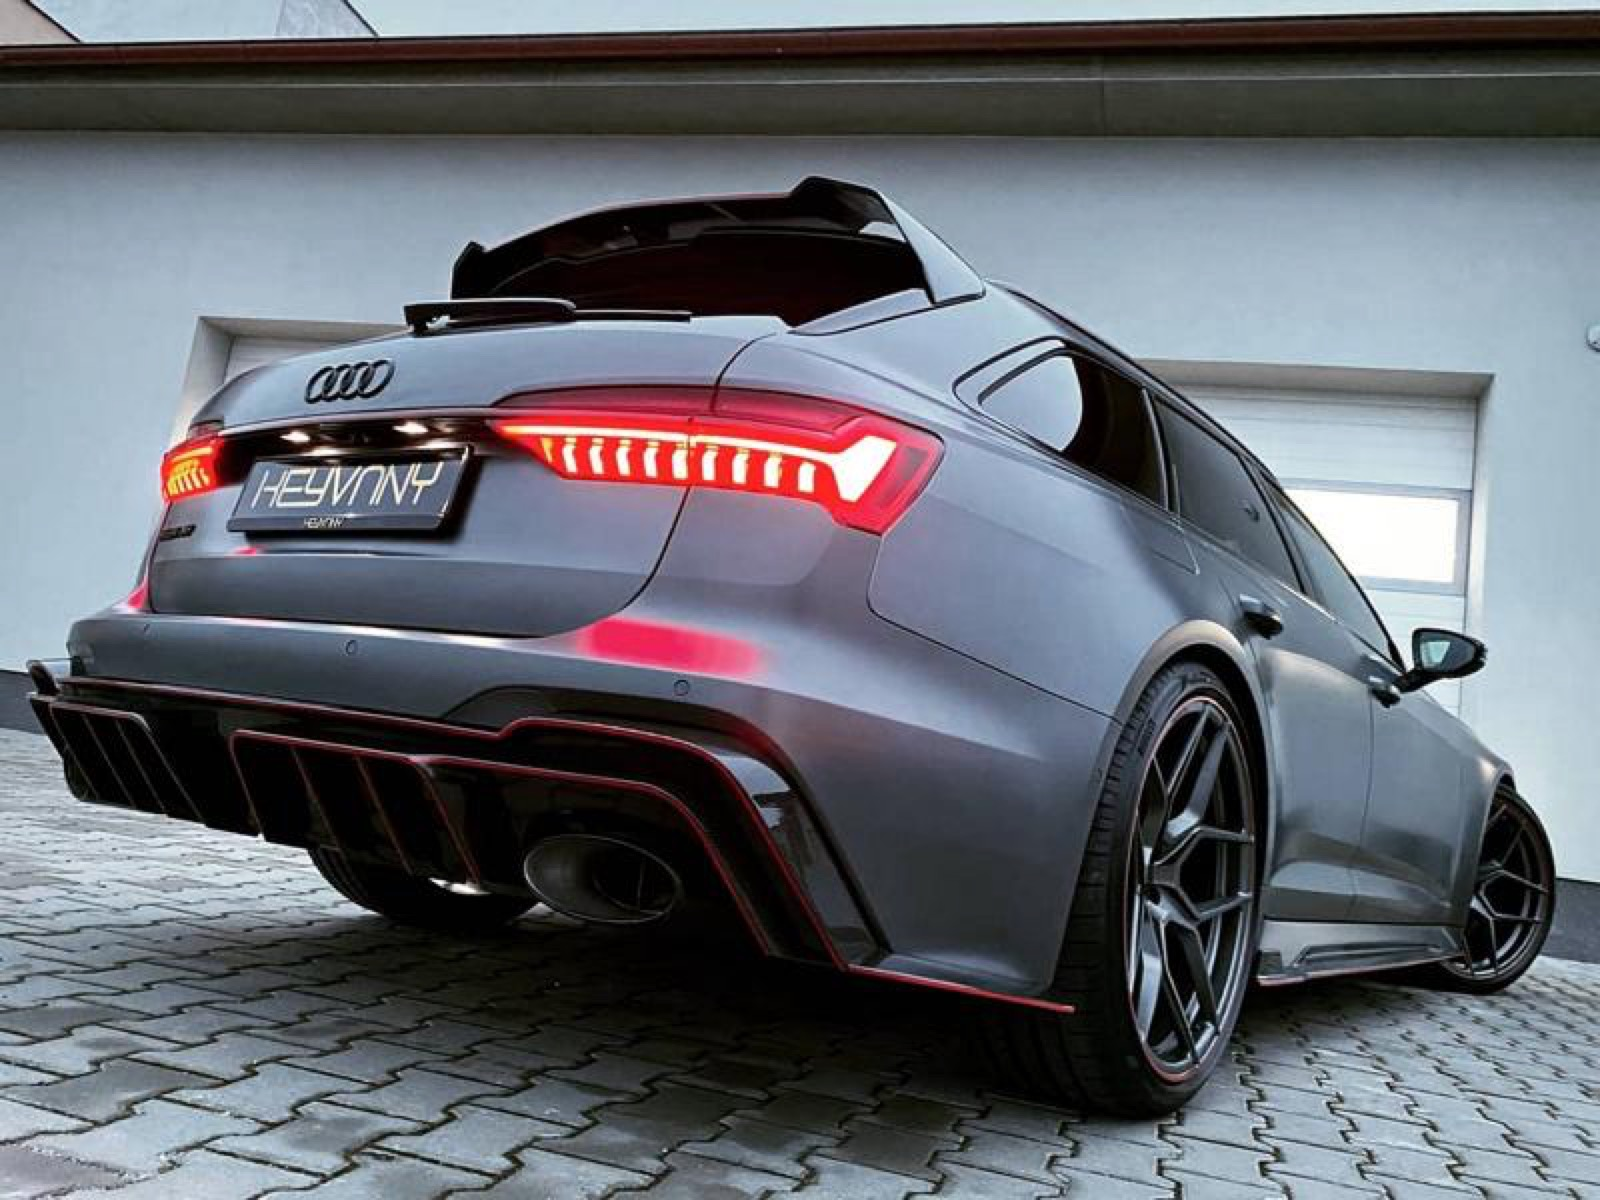 Audi-RS6-Avant-by-Keyvany-2